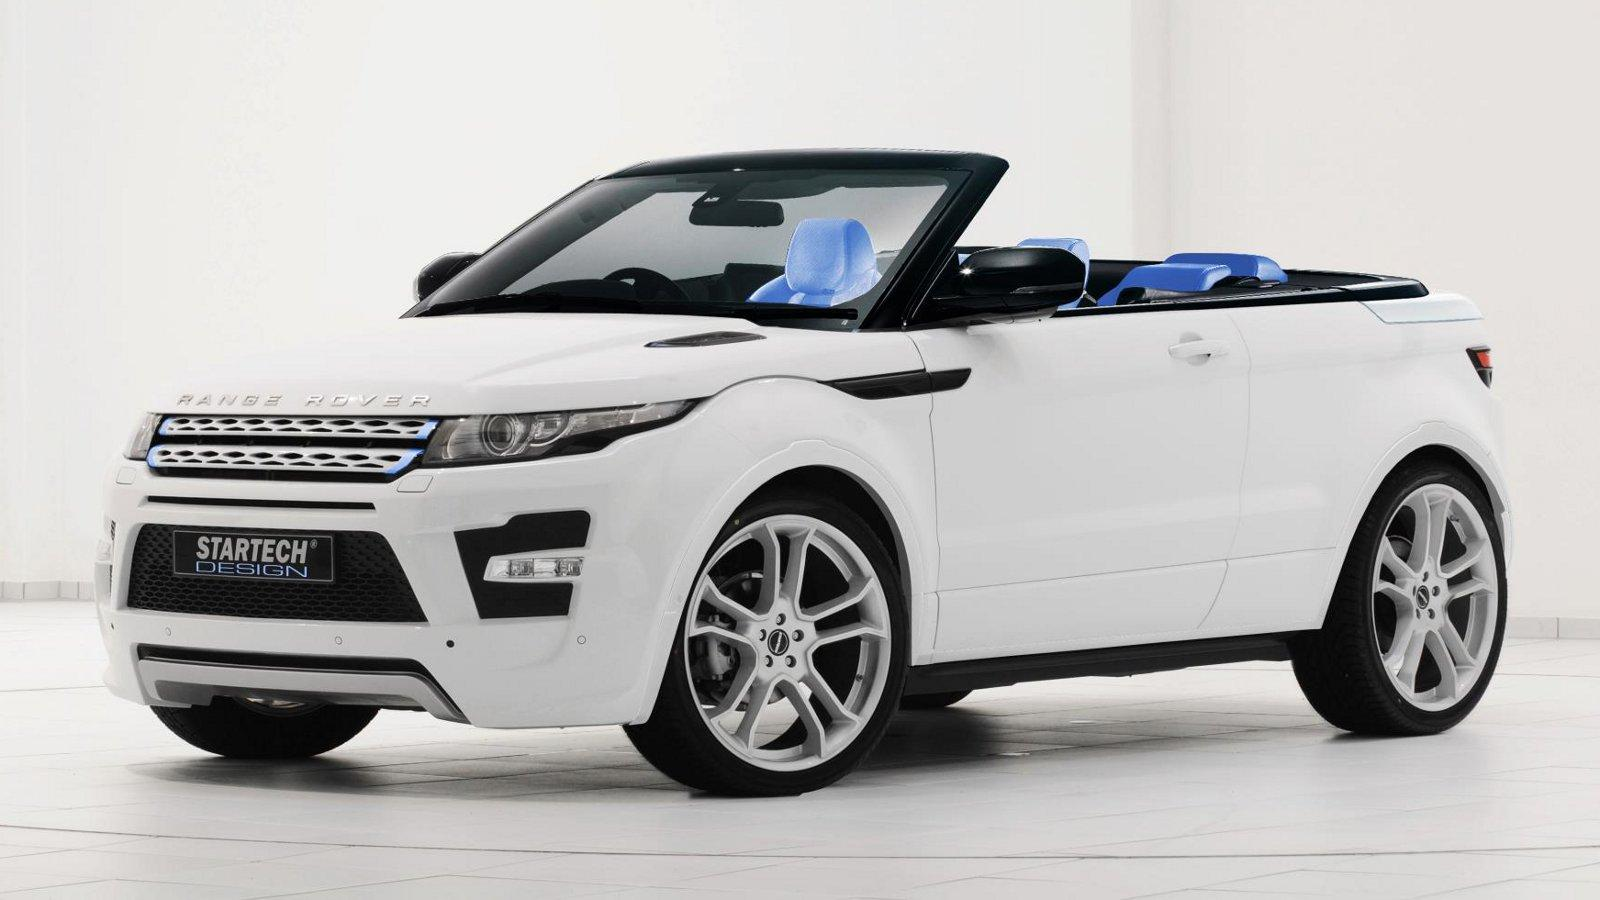 Range Rover Evoque Cabrio by Startech